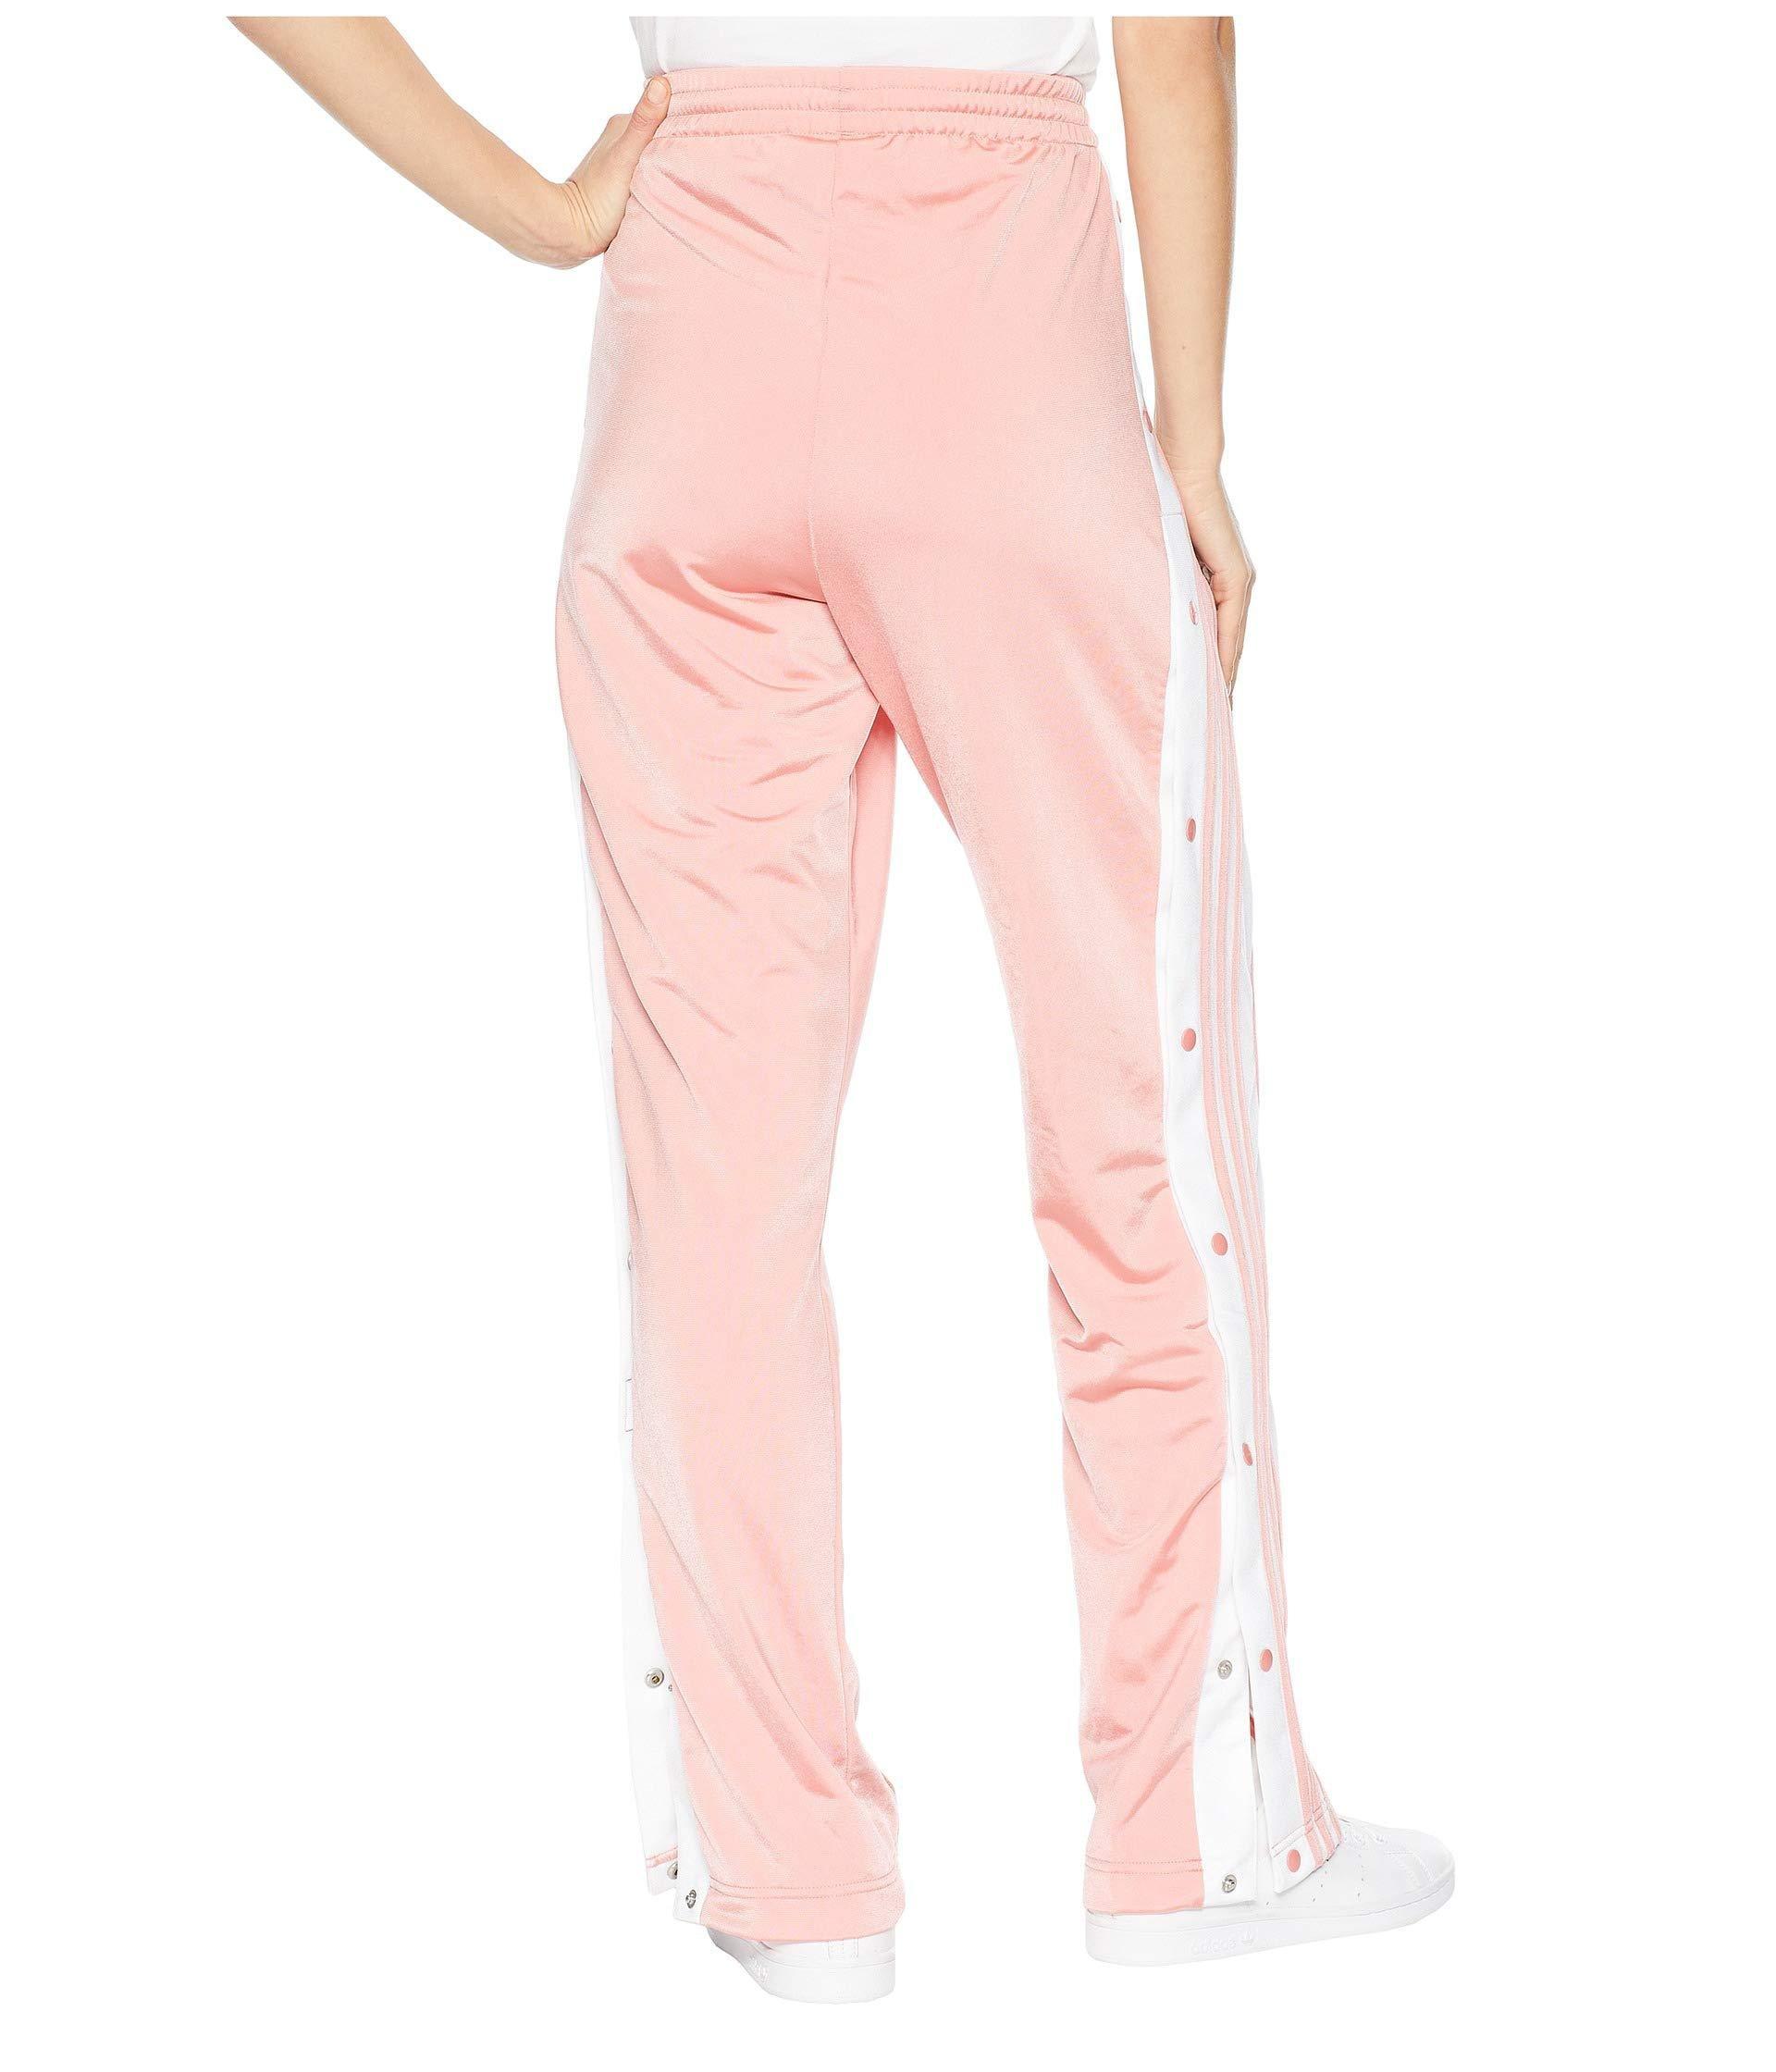 62393e94e86 adidas Originals Og Adibreak Track Pants (tactile Rose) Women's ...